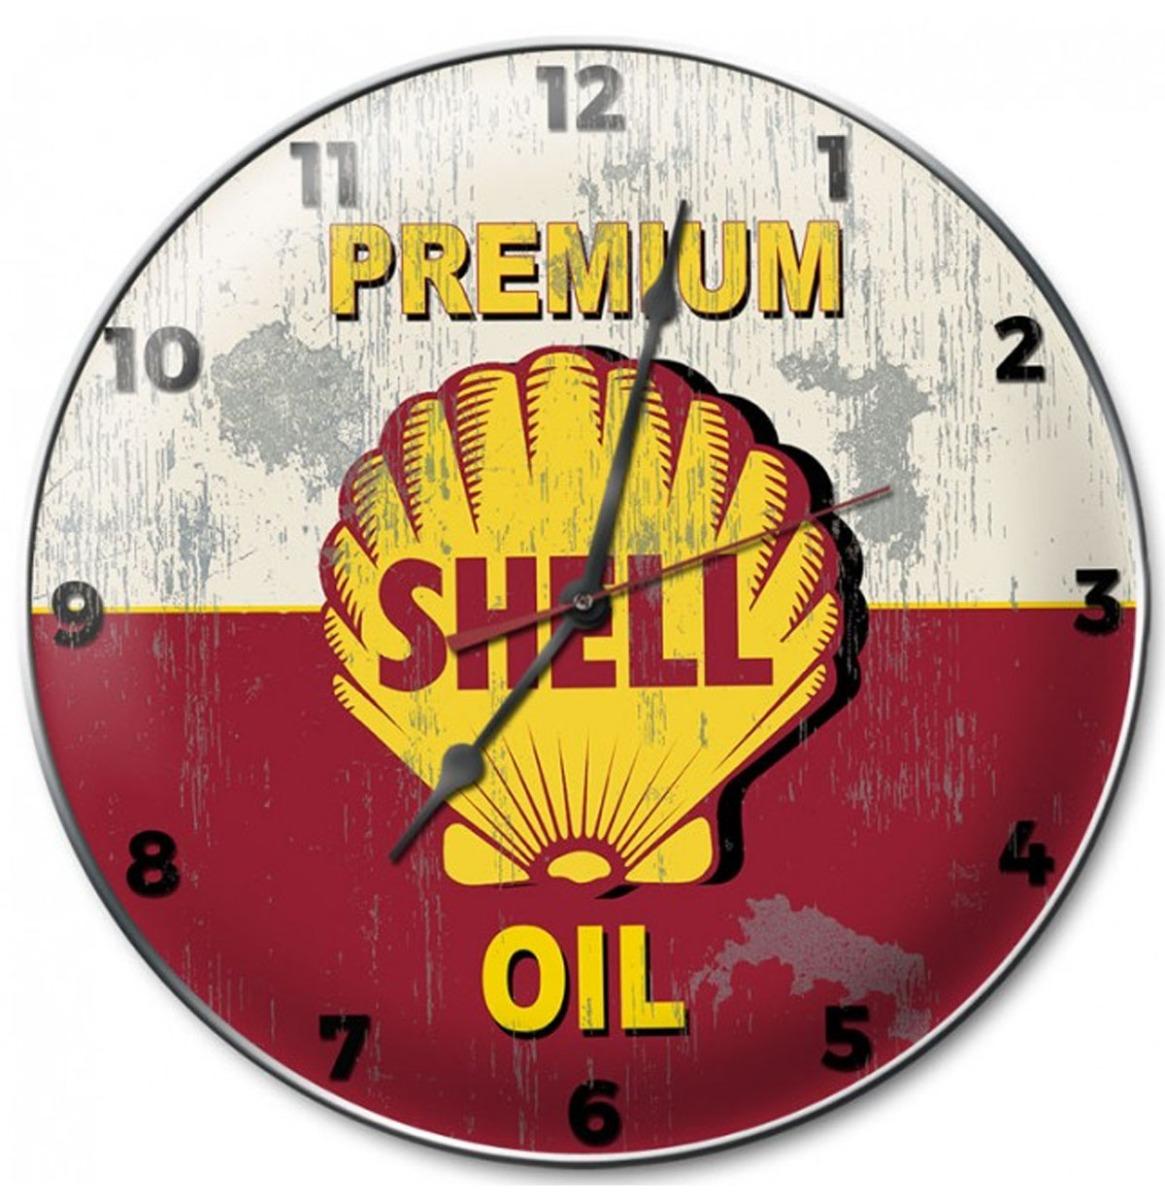 Shell Premium Oil Wall Clock 36 cm